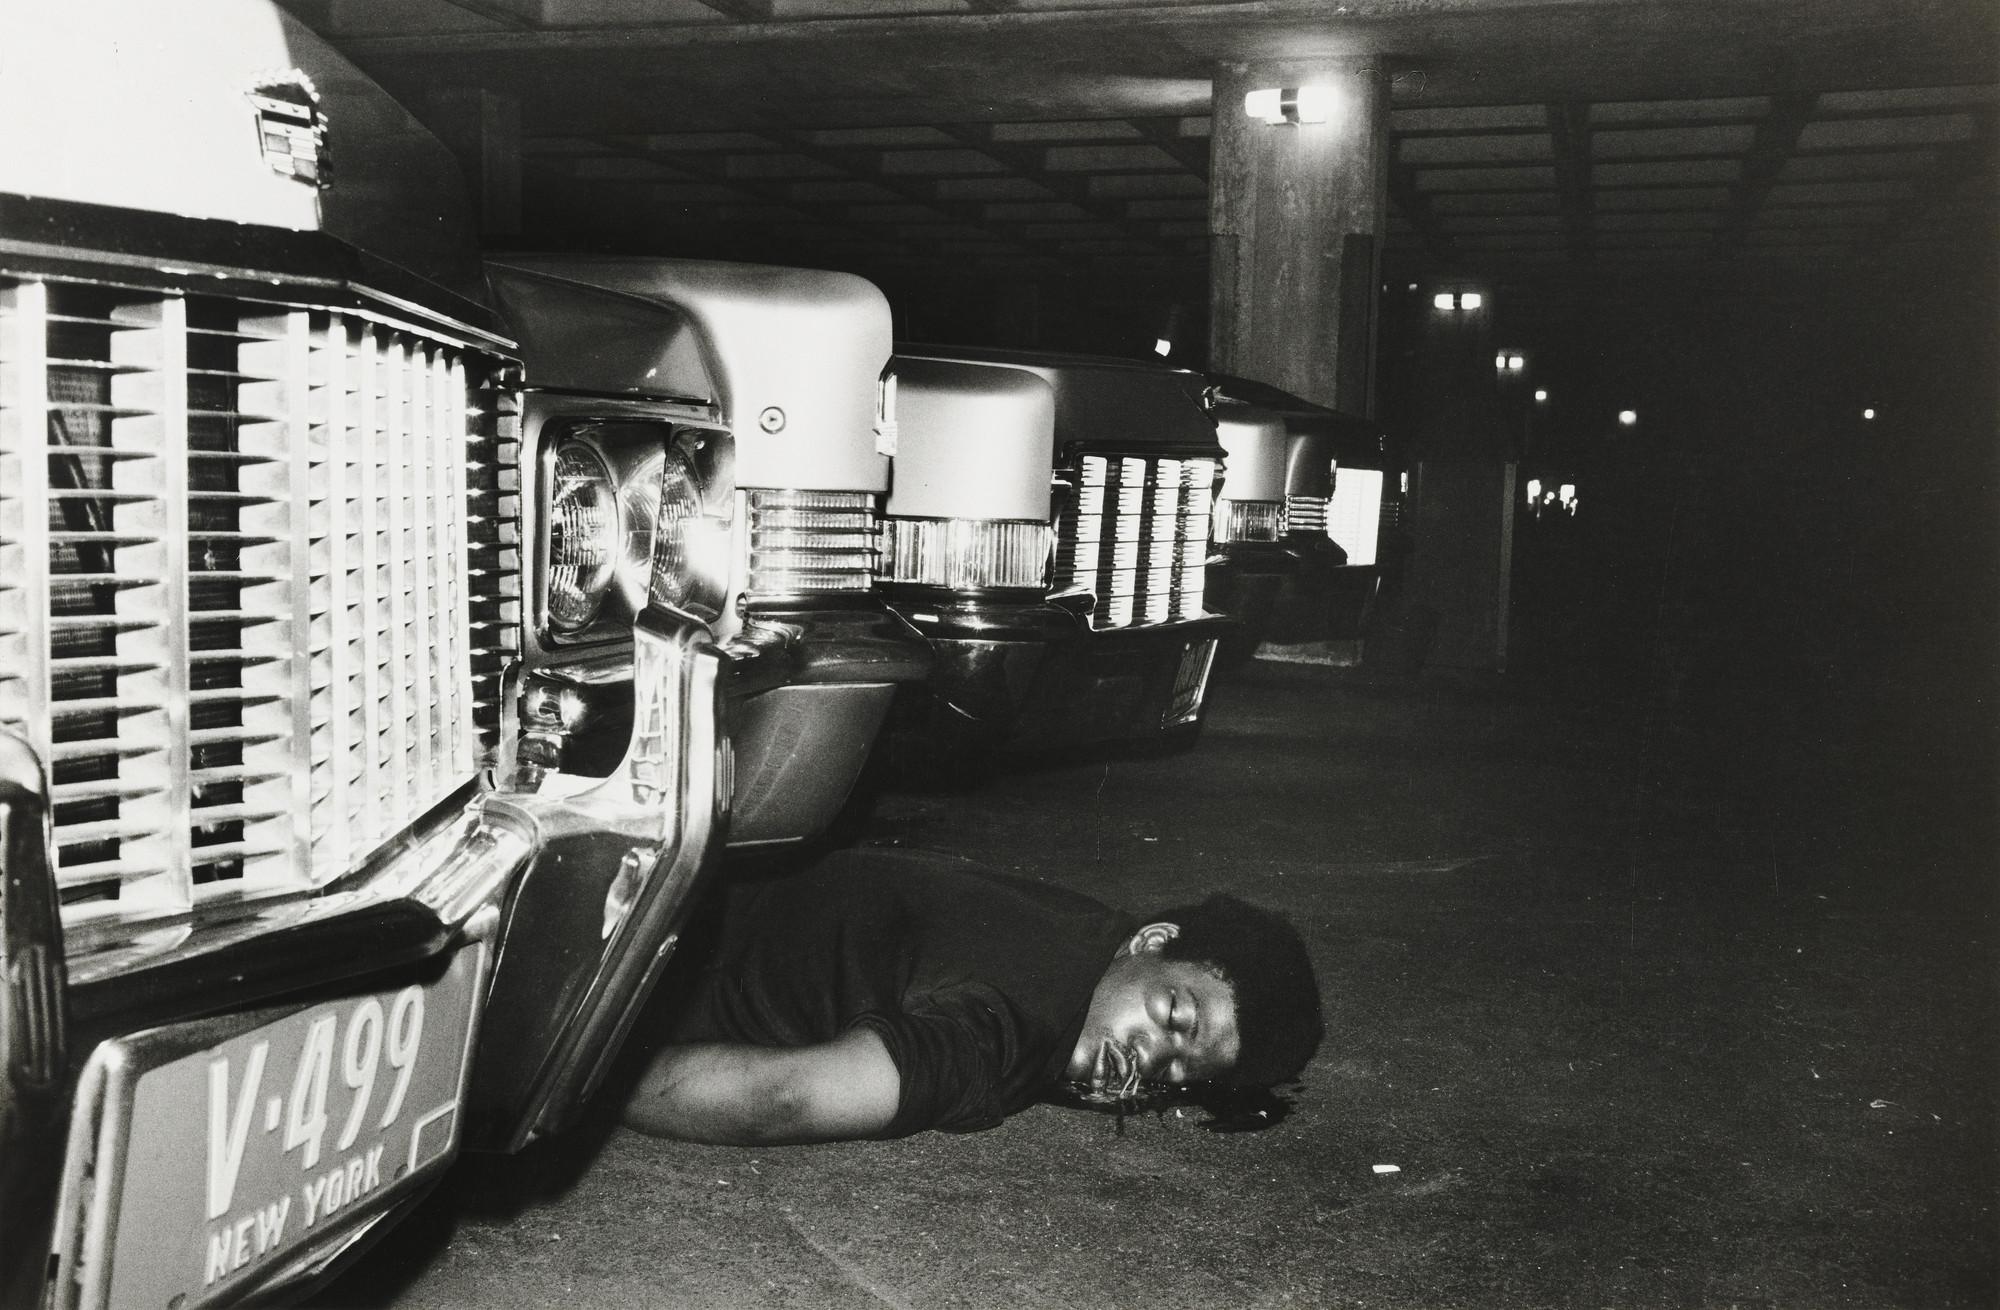 leonard freed new york murder in the garage of a lavish apartment